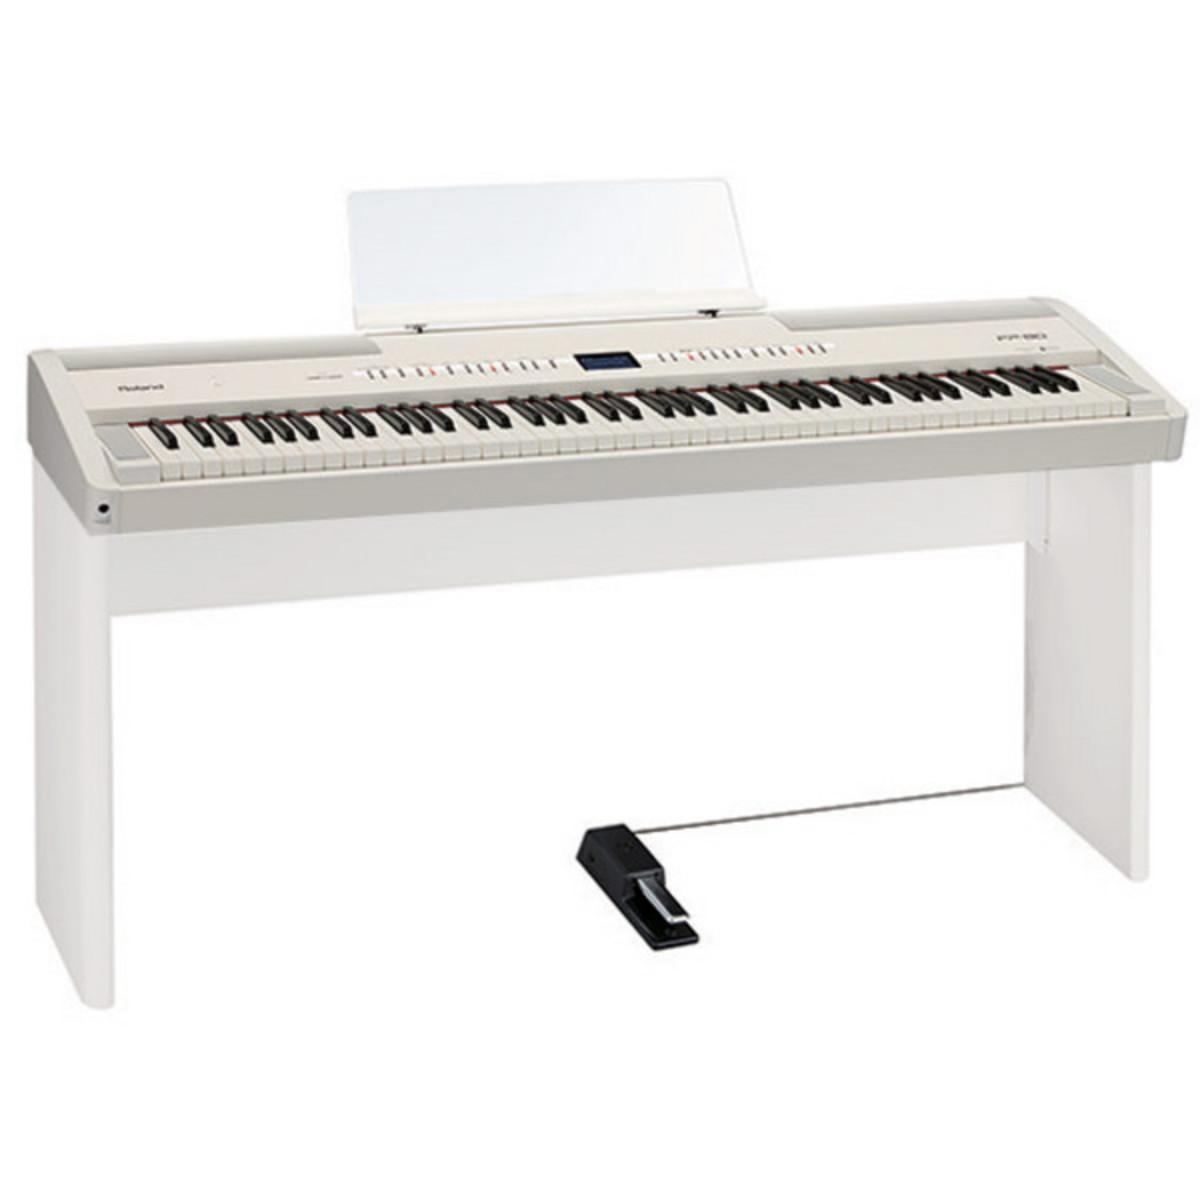 roland fp 80 supernatural digital piano white ex demo at. Black Bedroom Furniture Sets. Home Design Ideas